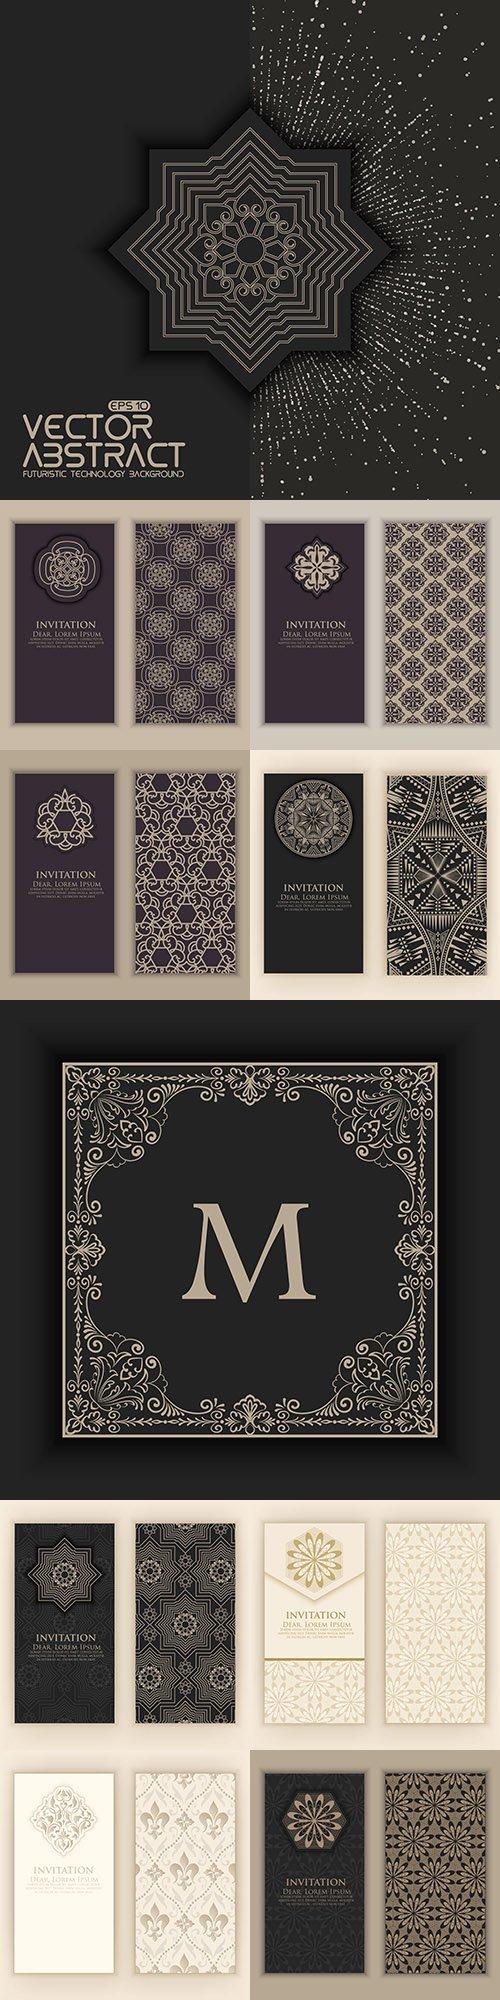 Invitation elements decorative ethnic Arabesque